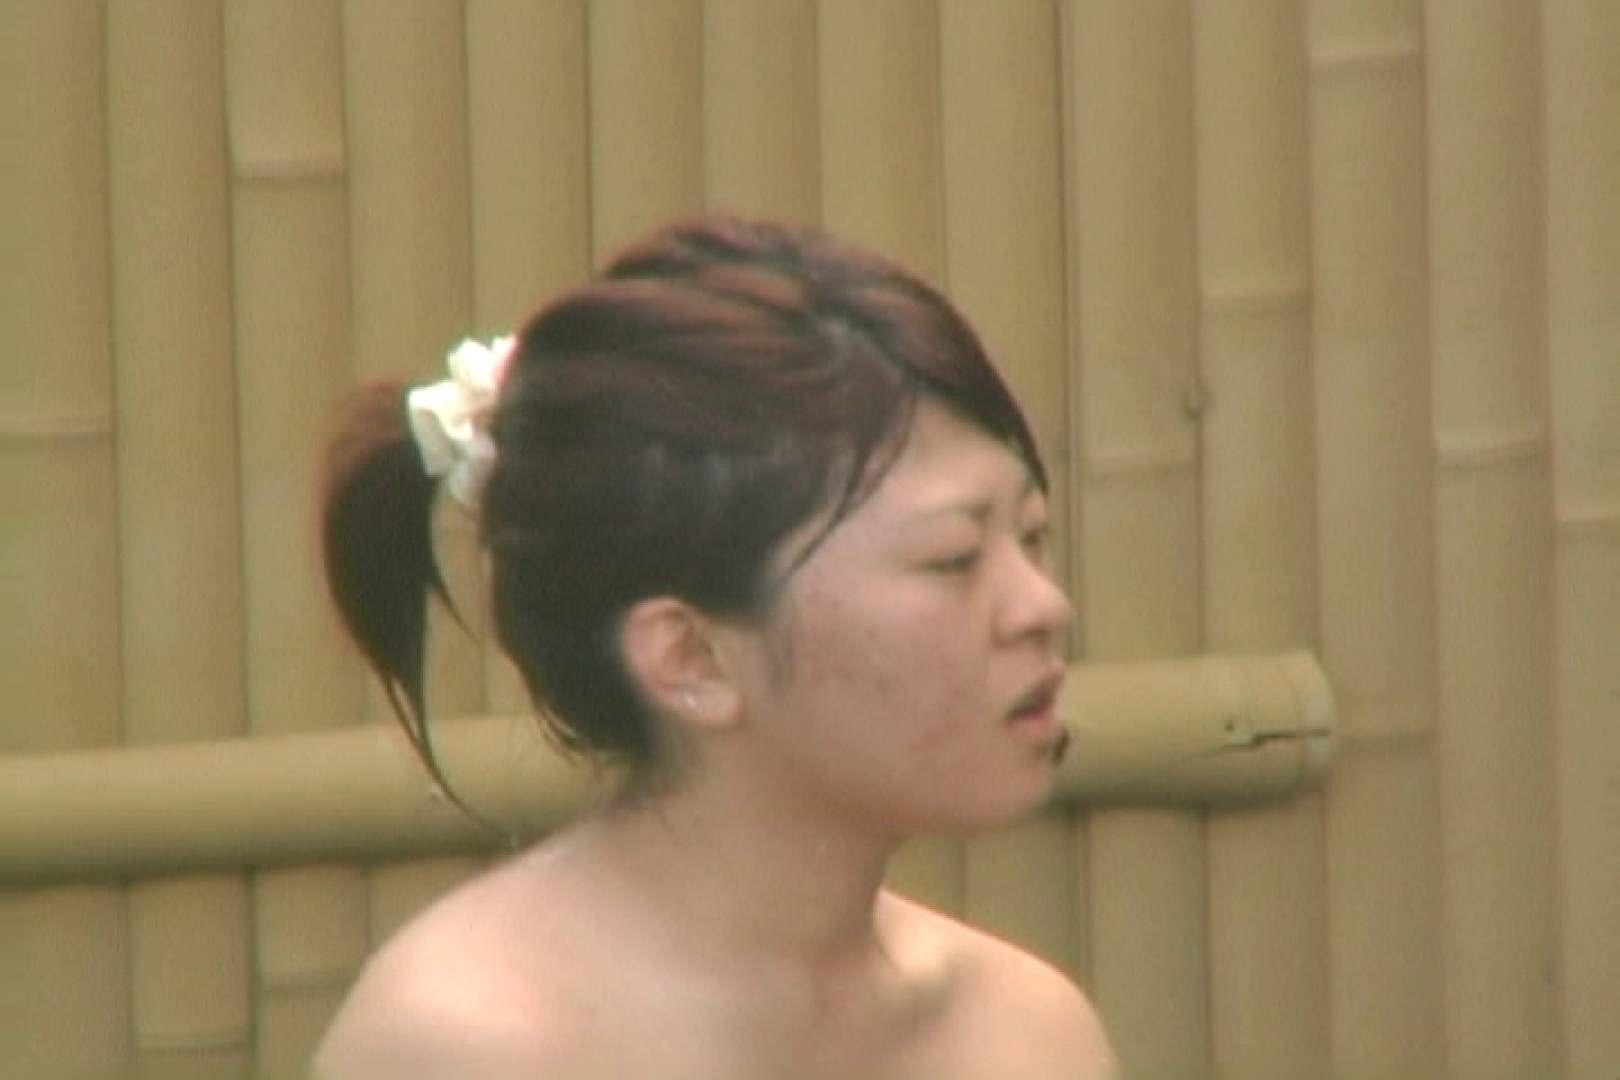 Aquaな露天風呂Vol.115 盗撮師作品 アダルト動画キャプチャ 91pic 77